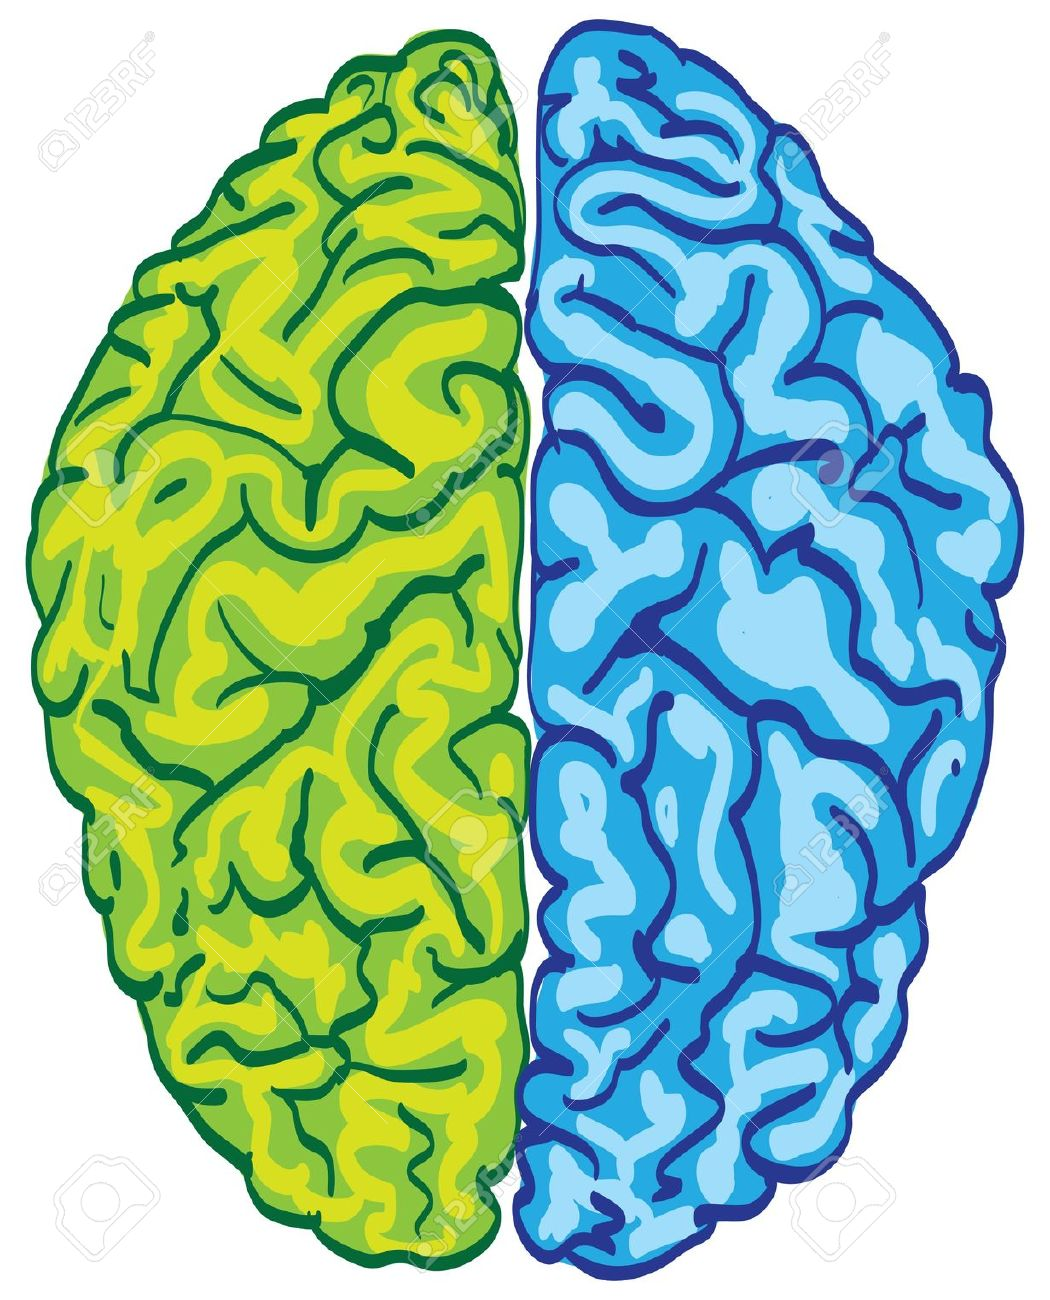 1050x1300 Best Brain Clipart